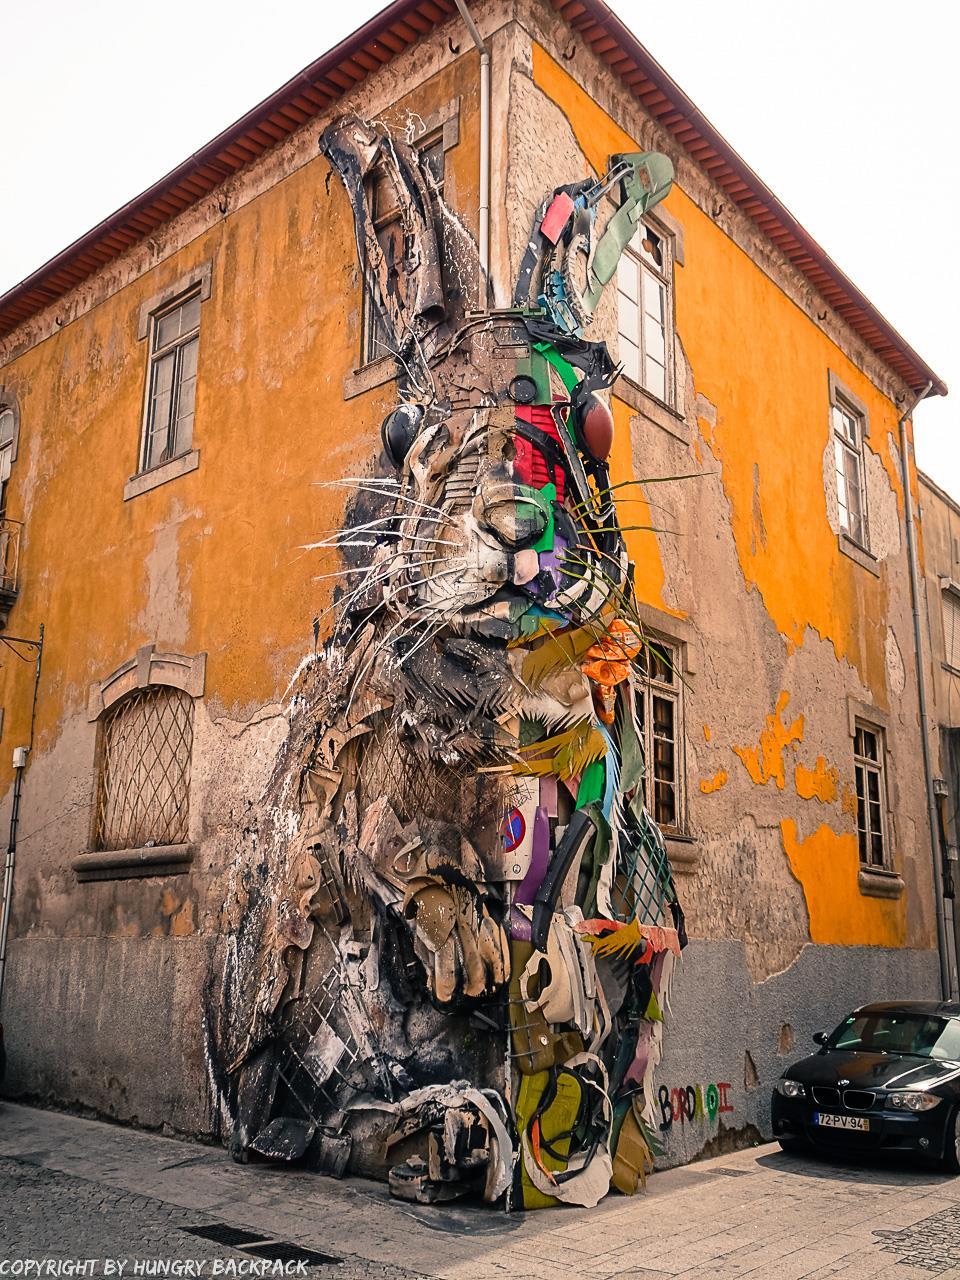 Porto street art_half rabbit by Bordalo II_2